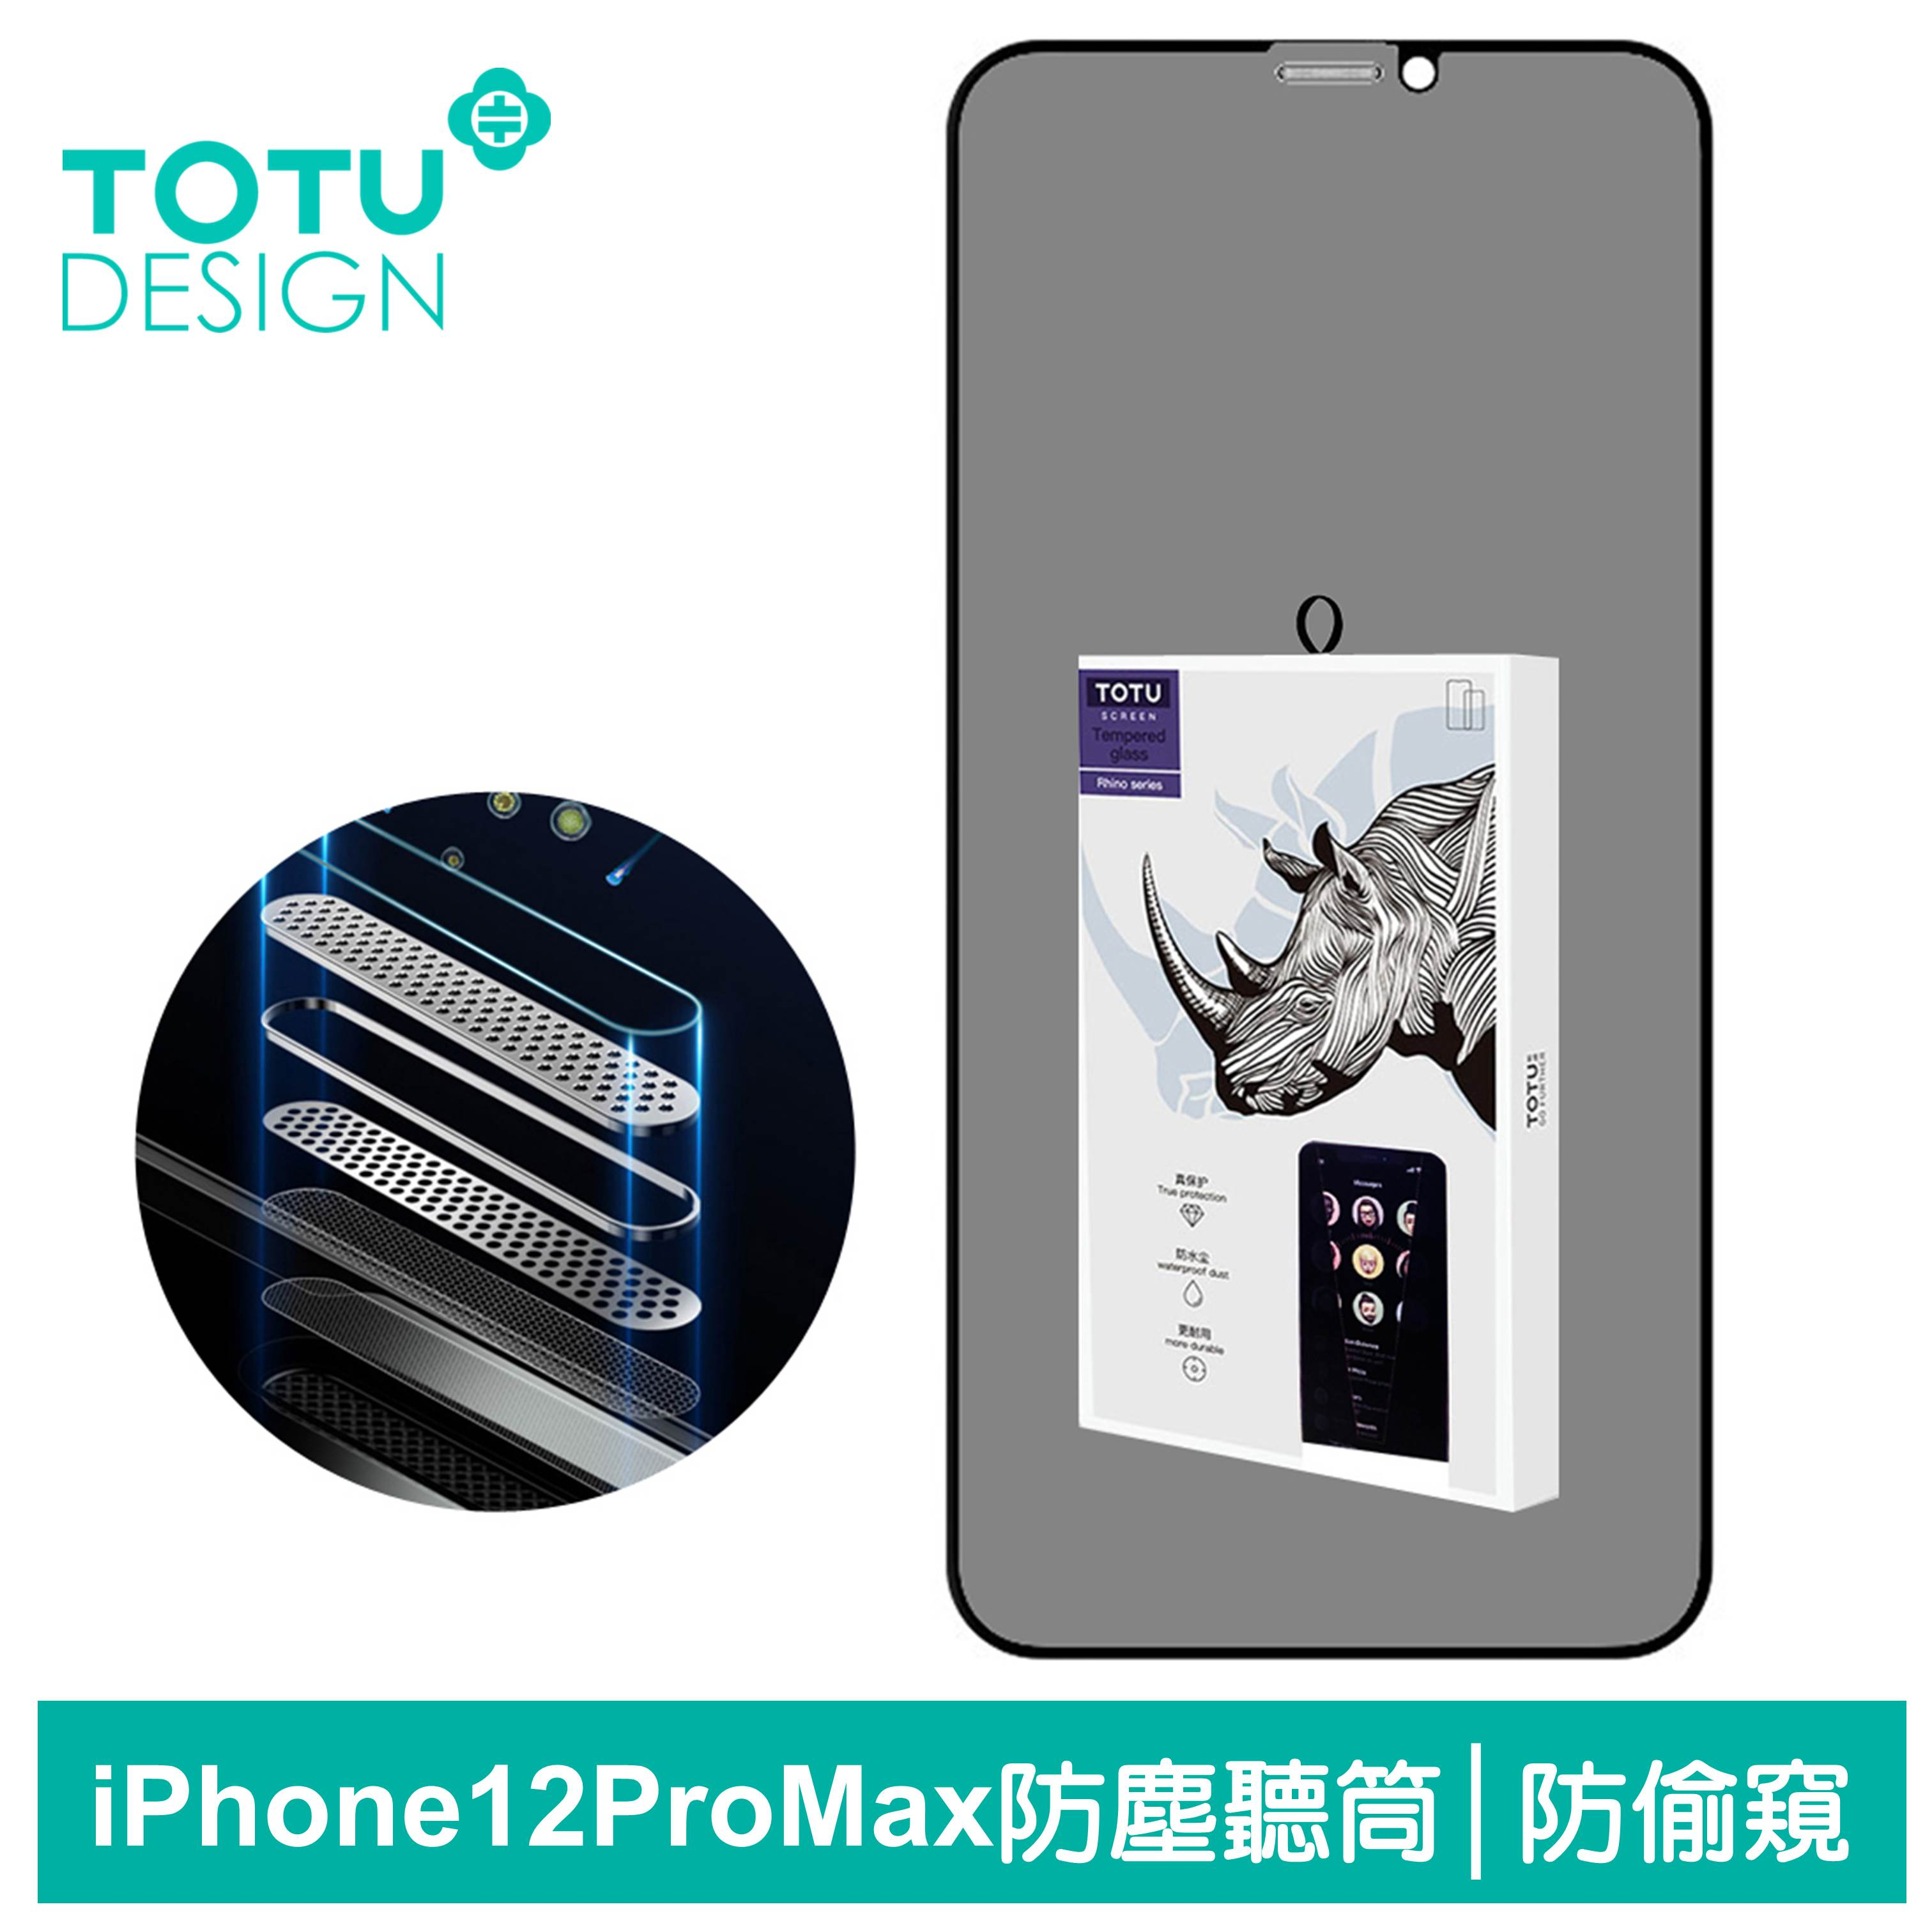 TOTU台灣官方 iPhone 12 Pro Max 鋼化膜 i12ProMax 保護貼 6.7吋 保護膜 防偷窺絲印防塵聽筒 犀牛家族